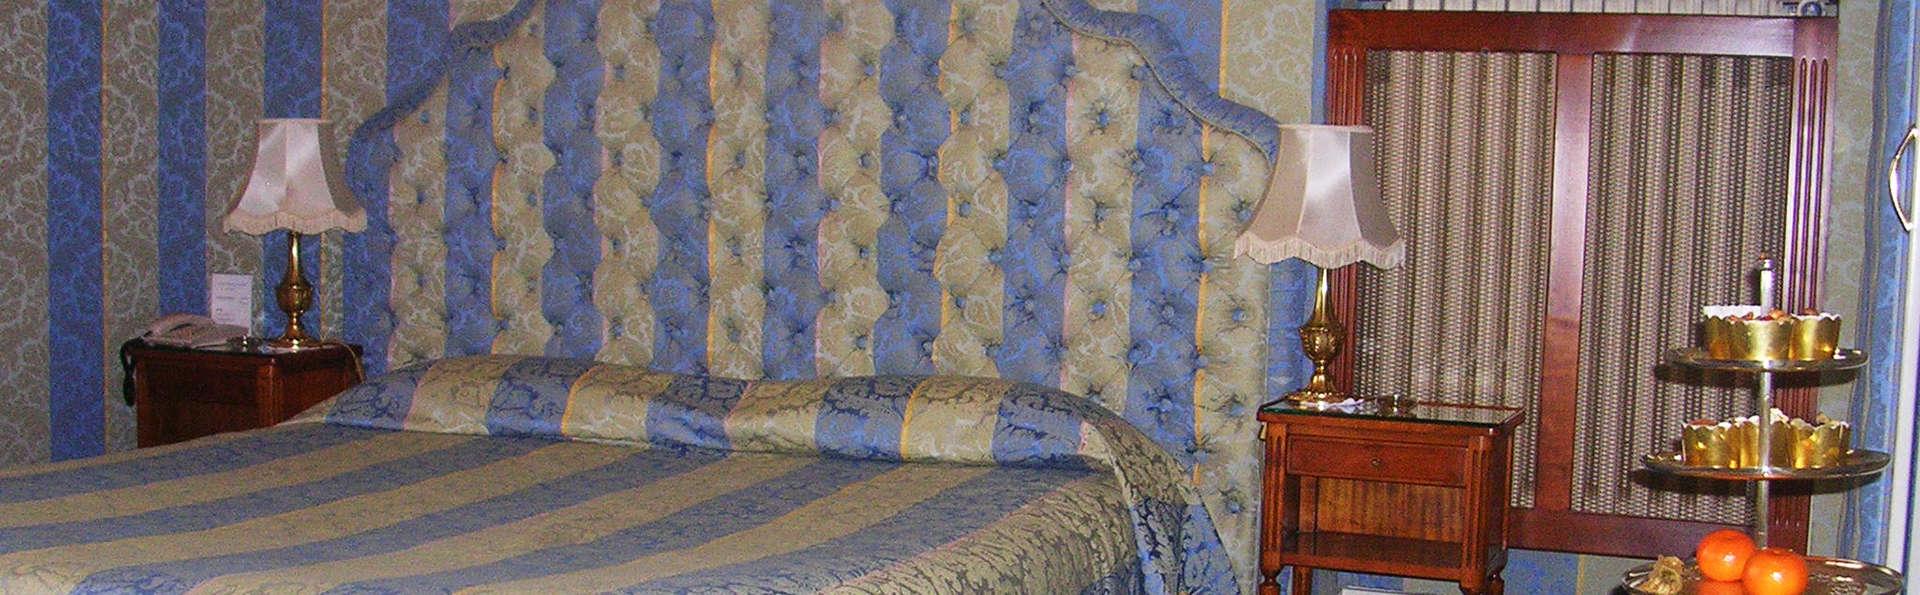 Grand Hôtel des Templiers - EDIT_room3.jpg